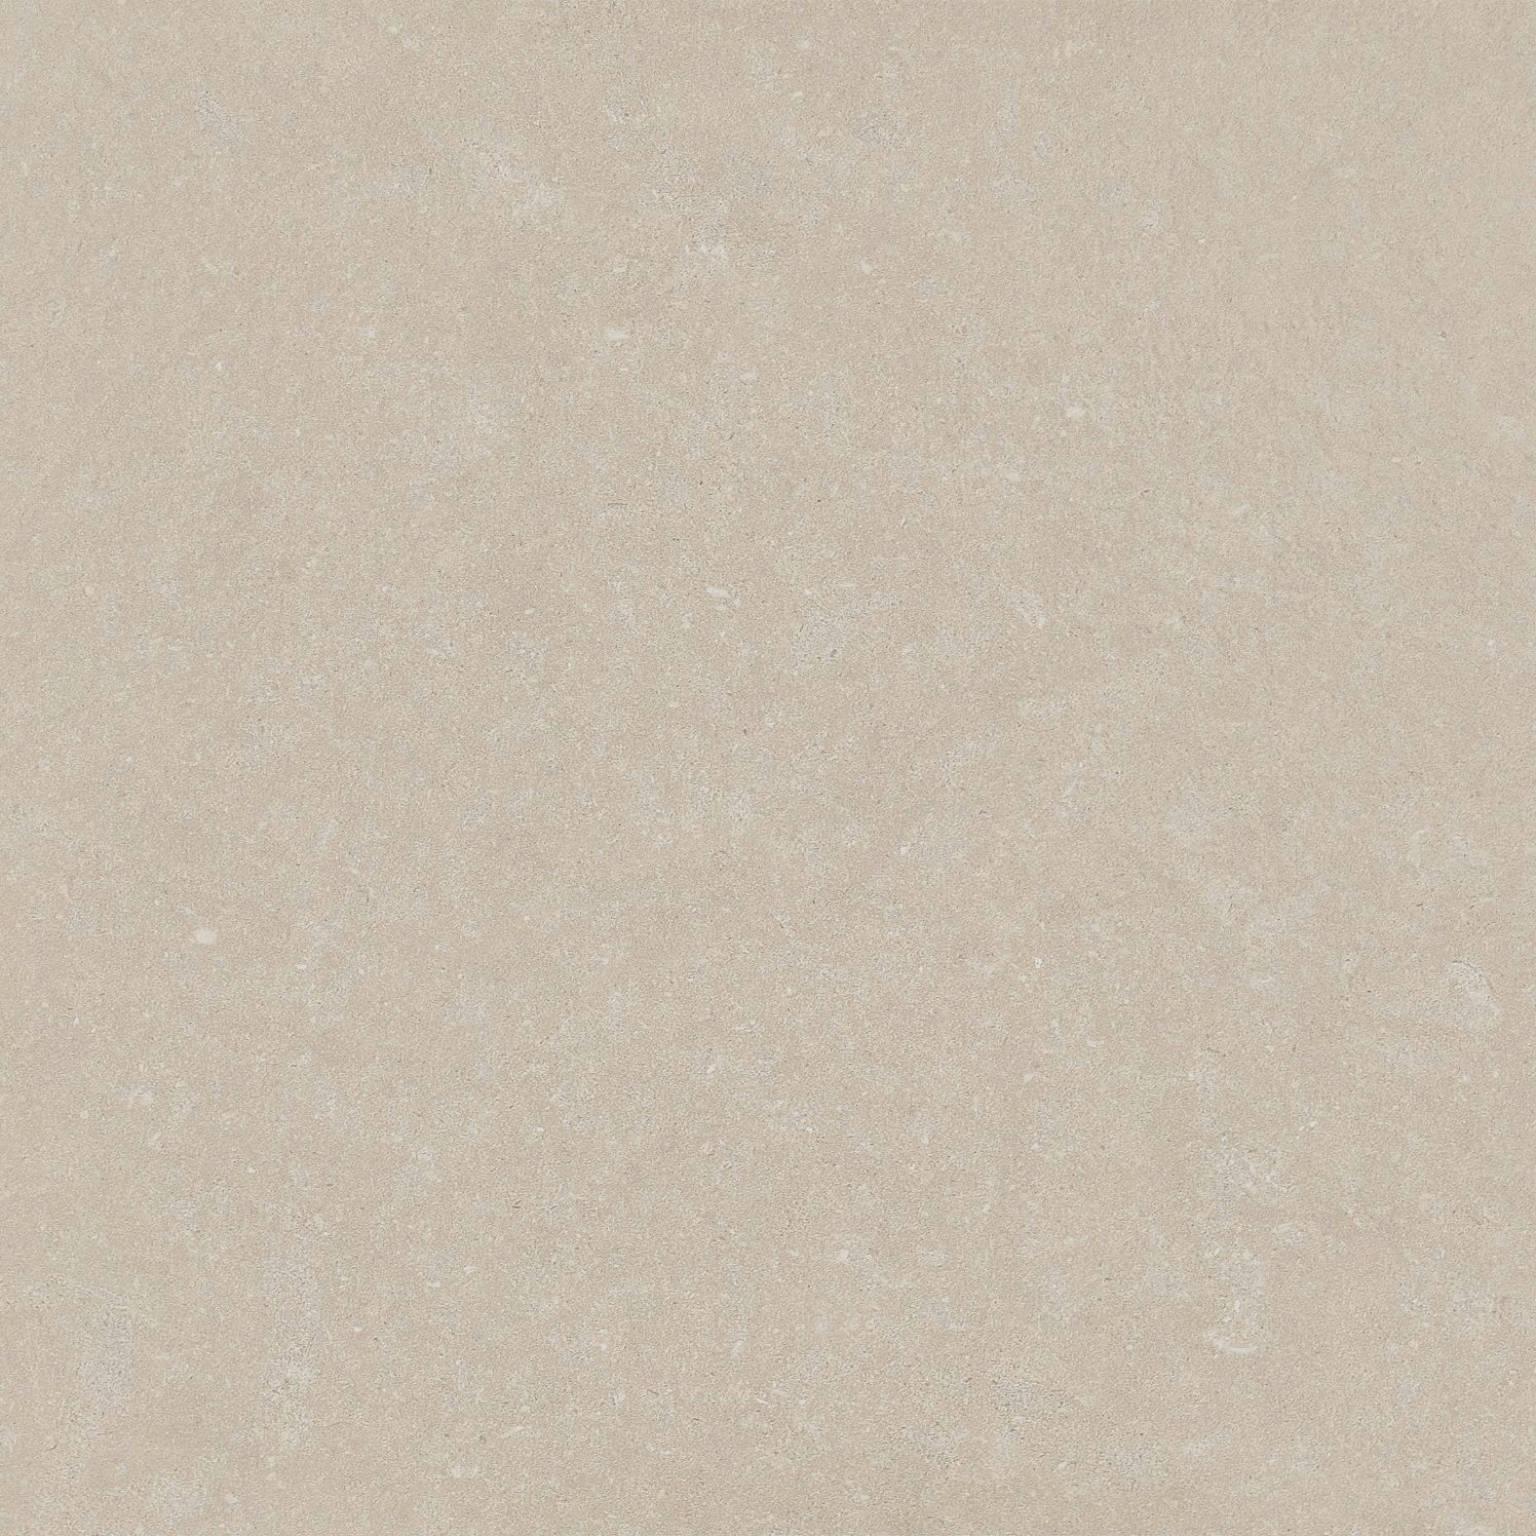 Qstone Sand 60x60 | Newker